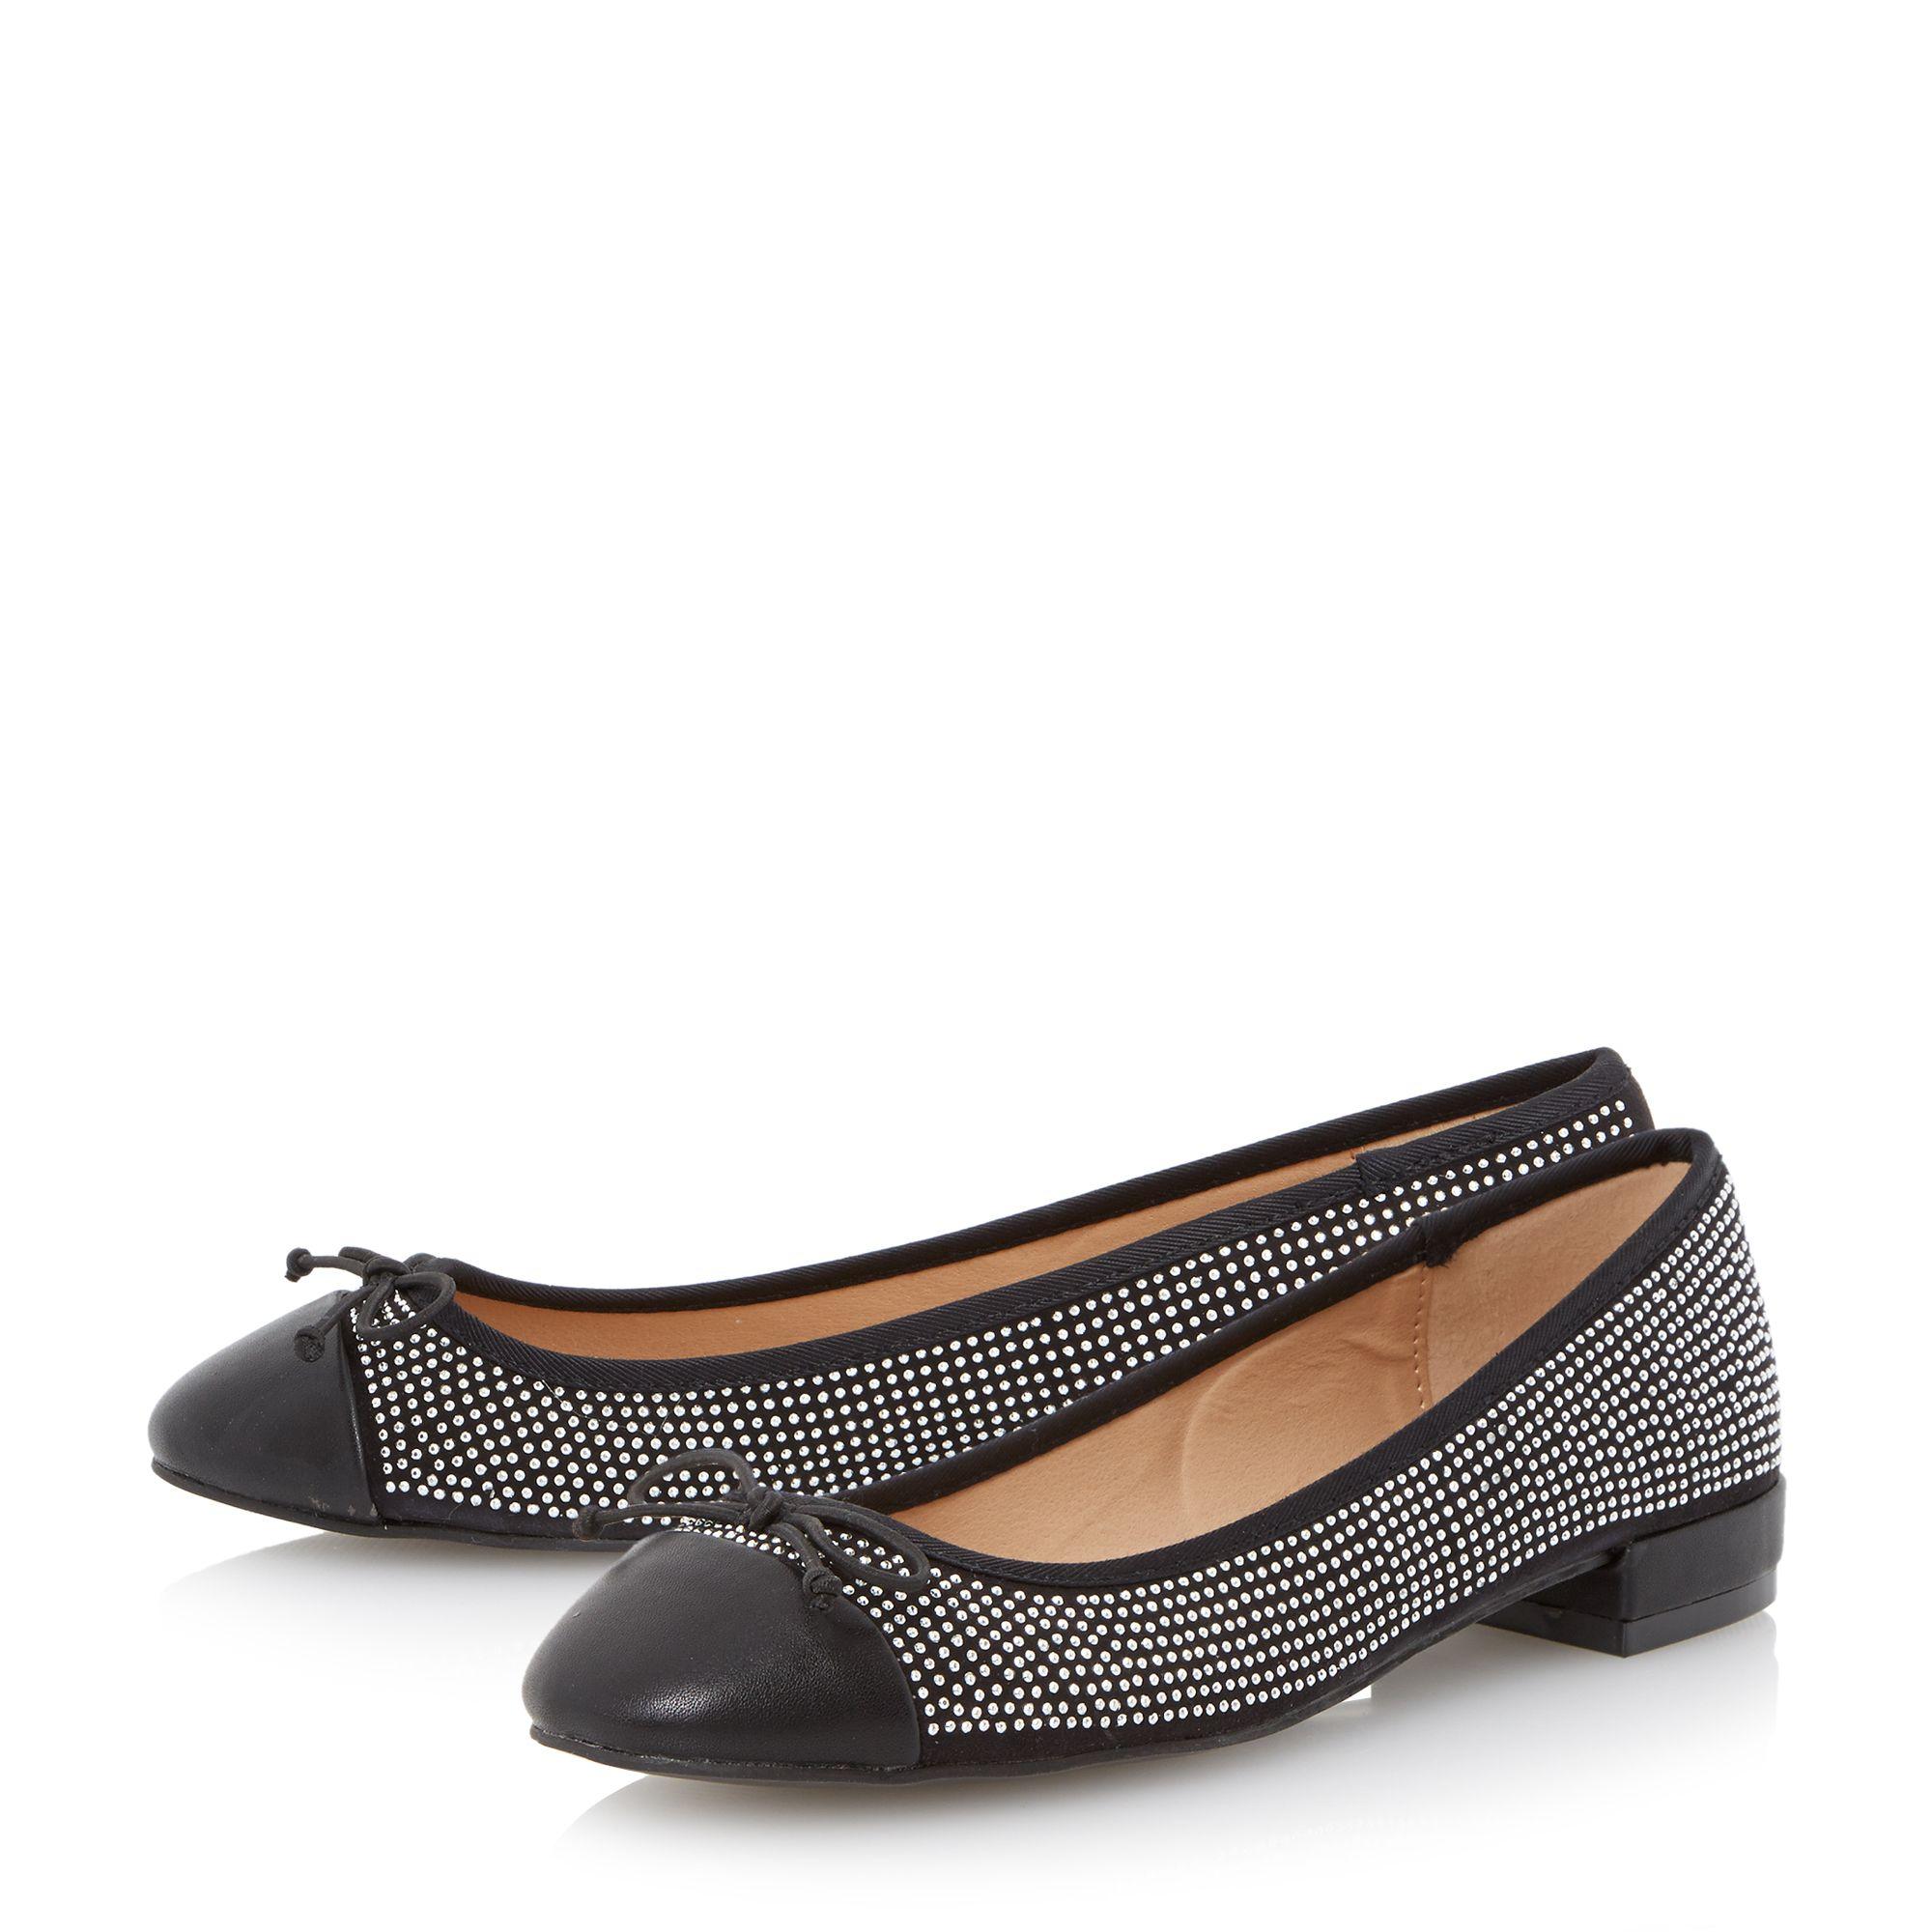 dune hascha studded ballerina shoes in black lyst